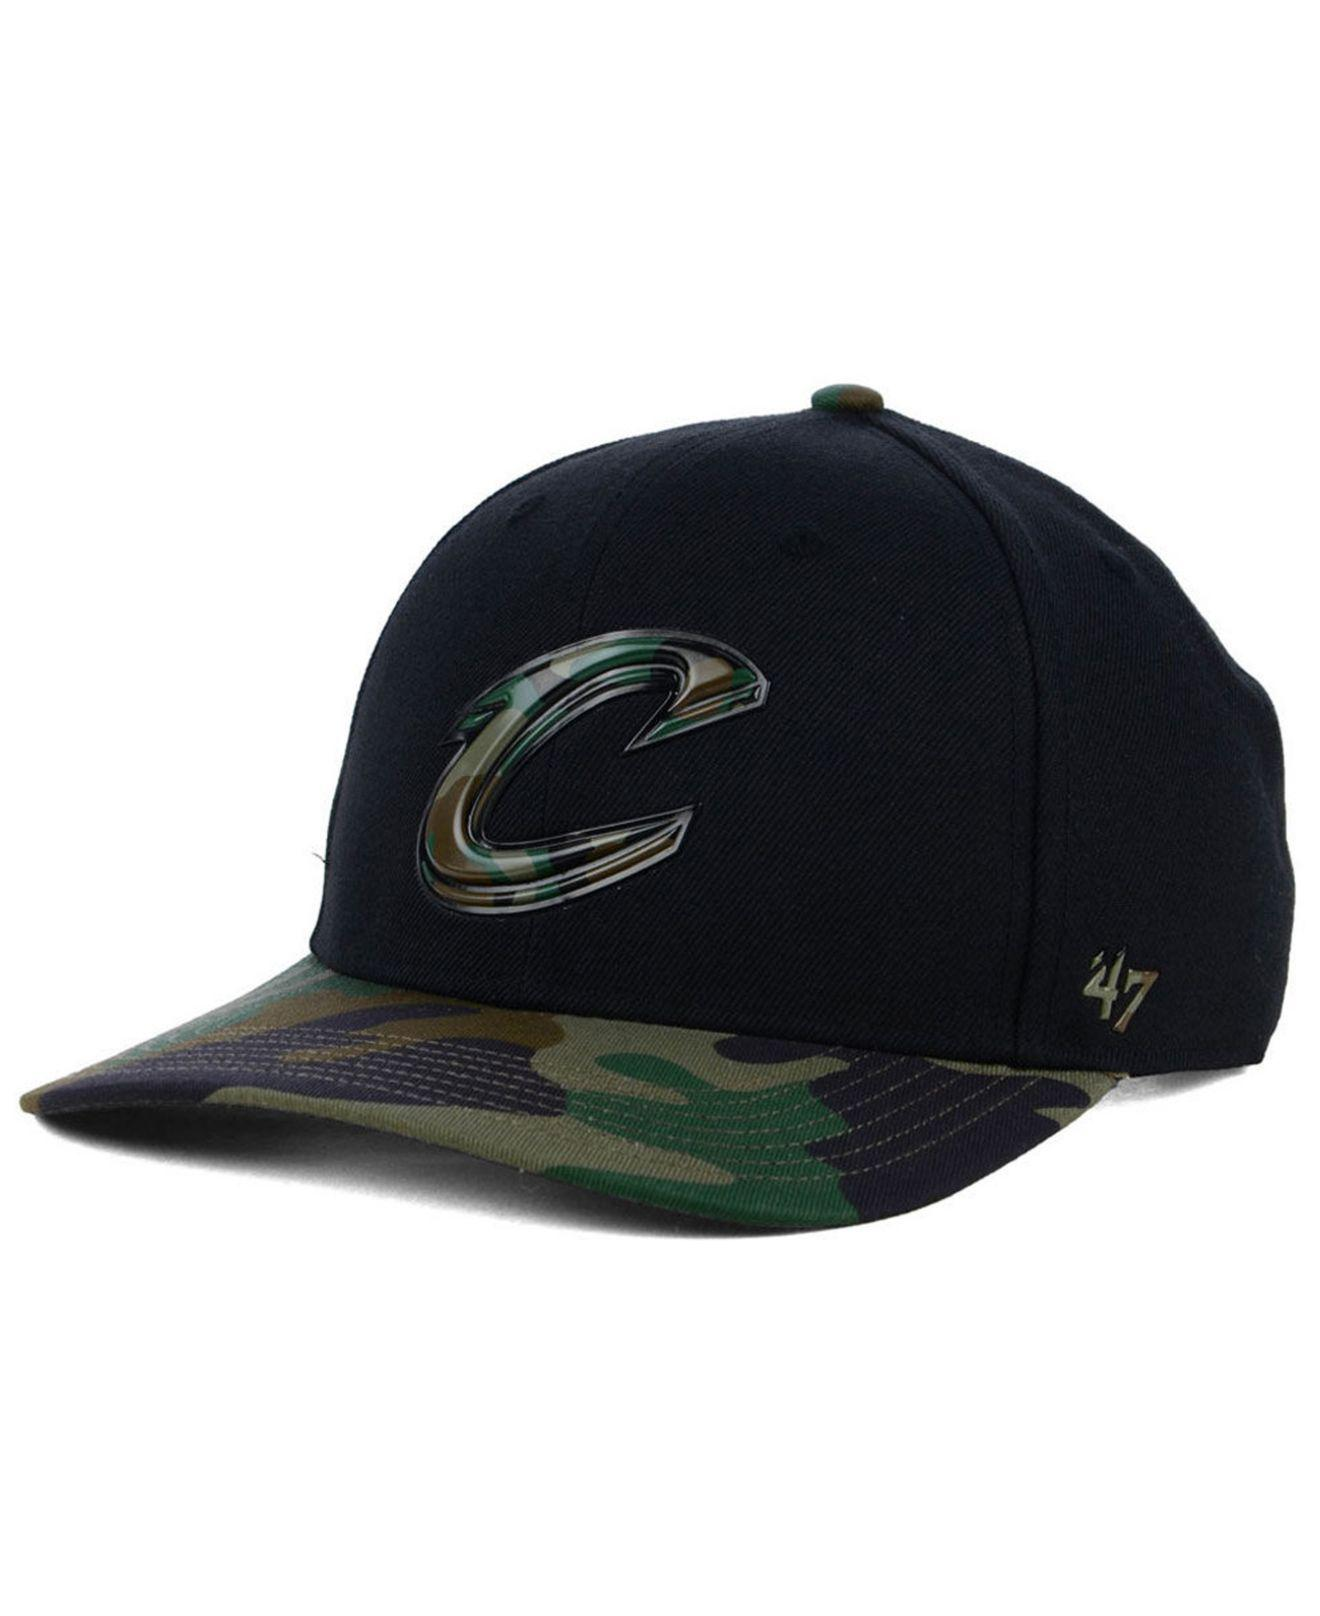 6a5f7f82a7e Lyst - 47 Brand Cleveland Cavaliers Caster Camo Mvp Cap in Black for Men